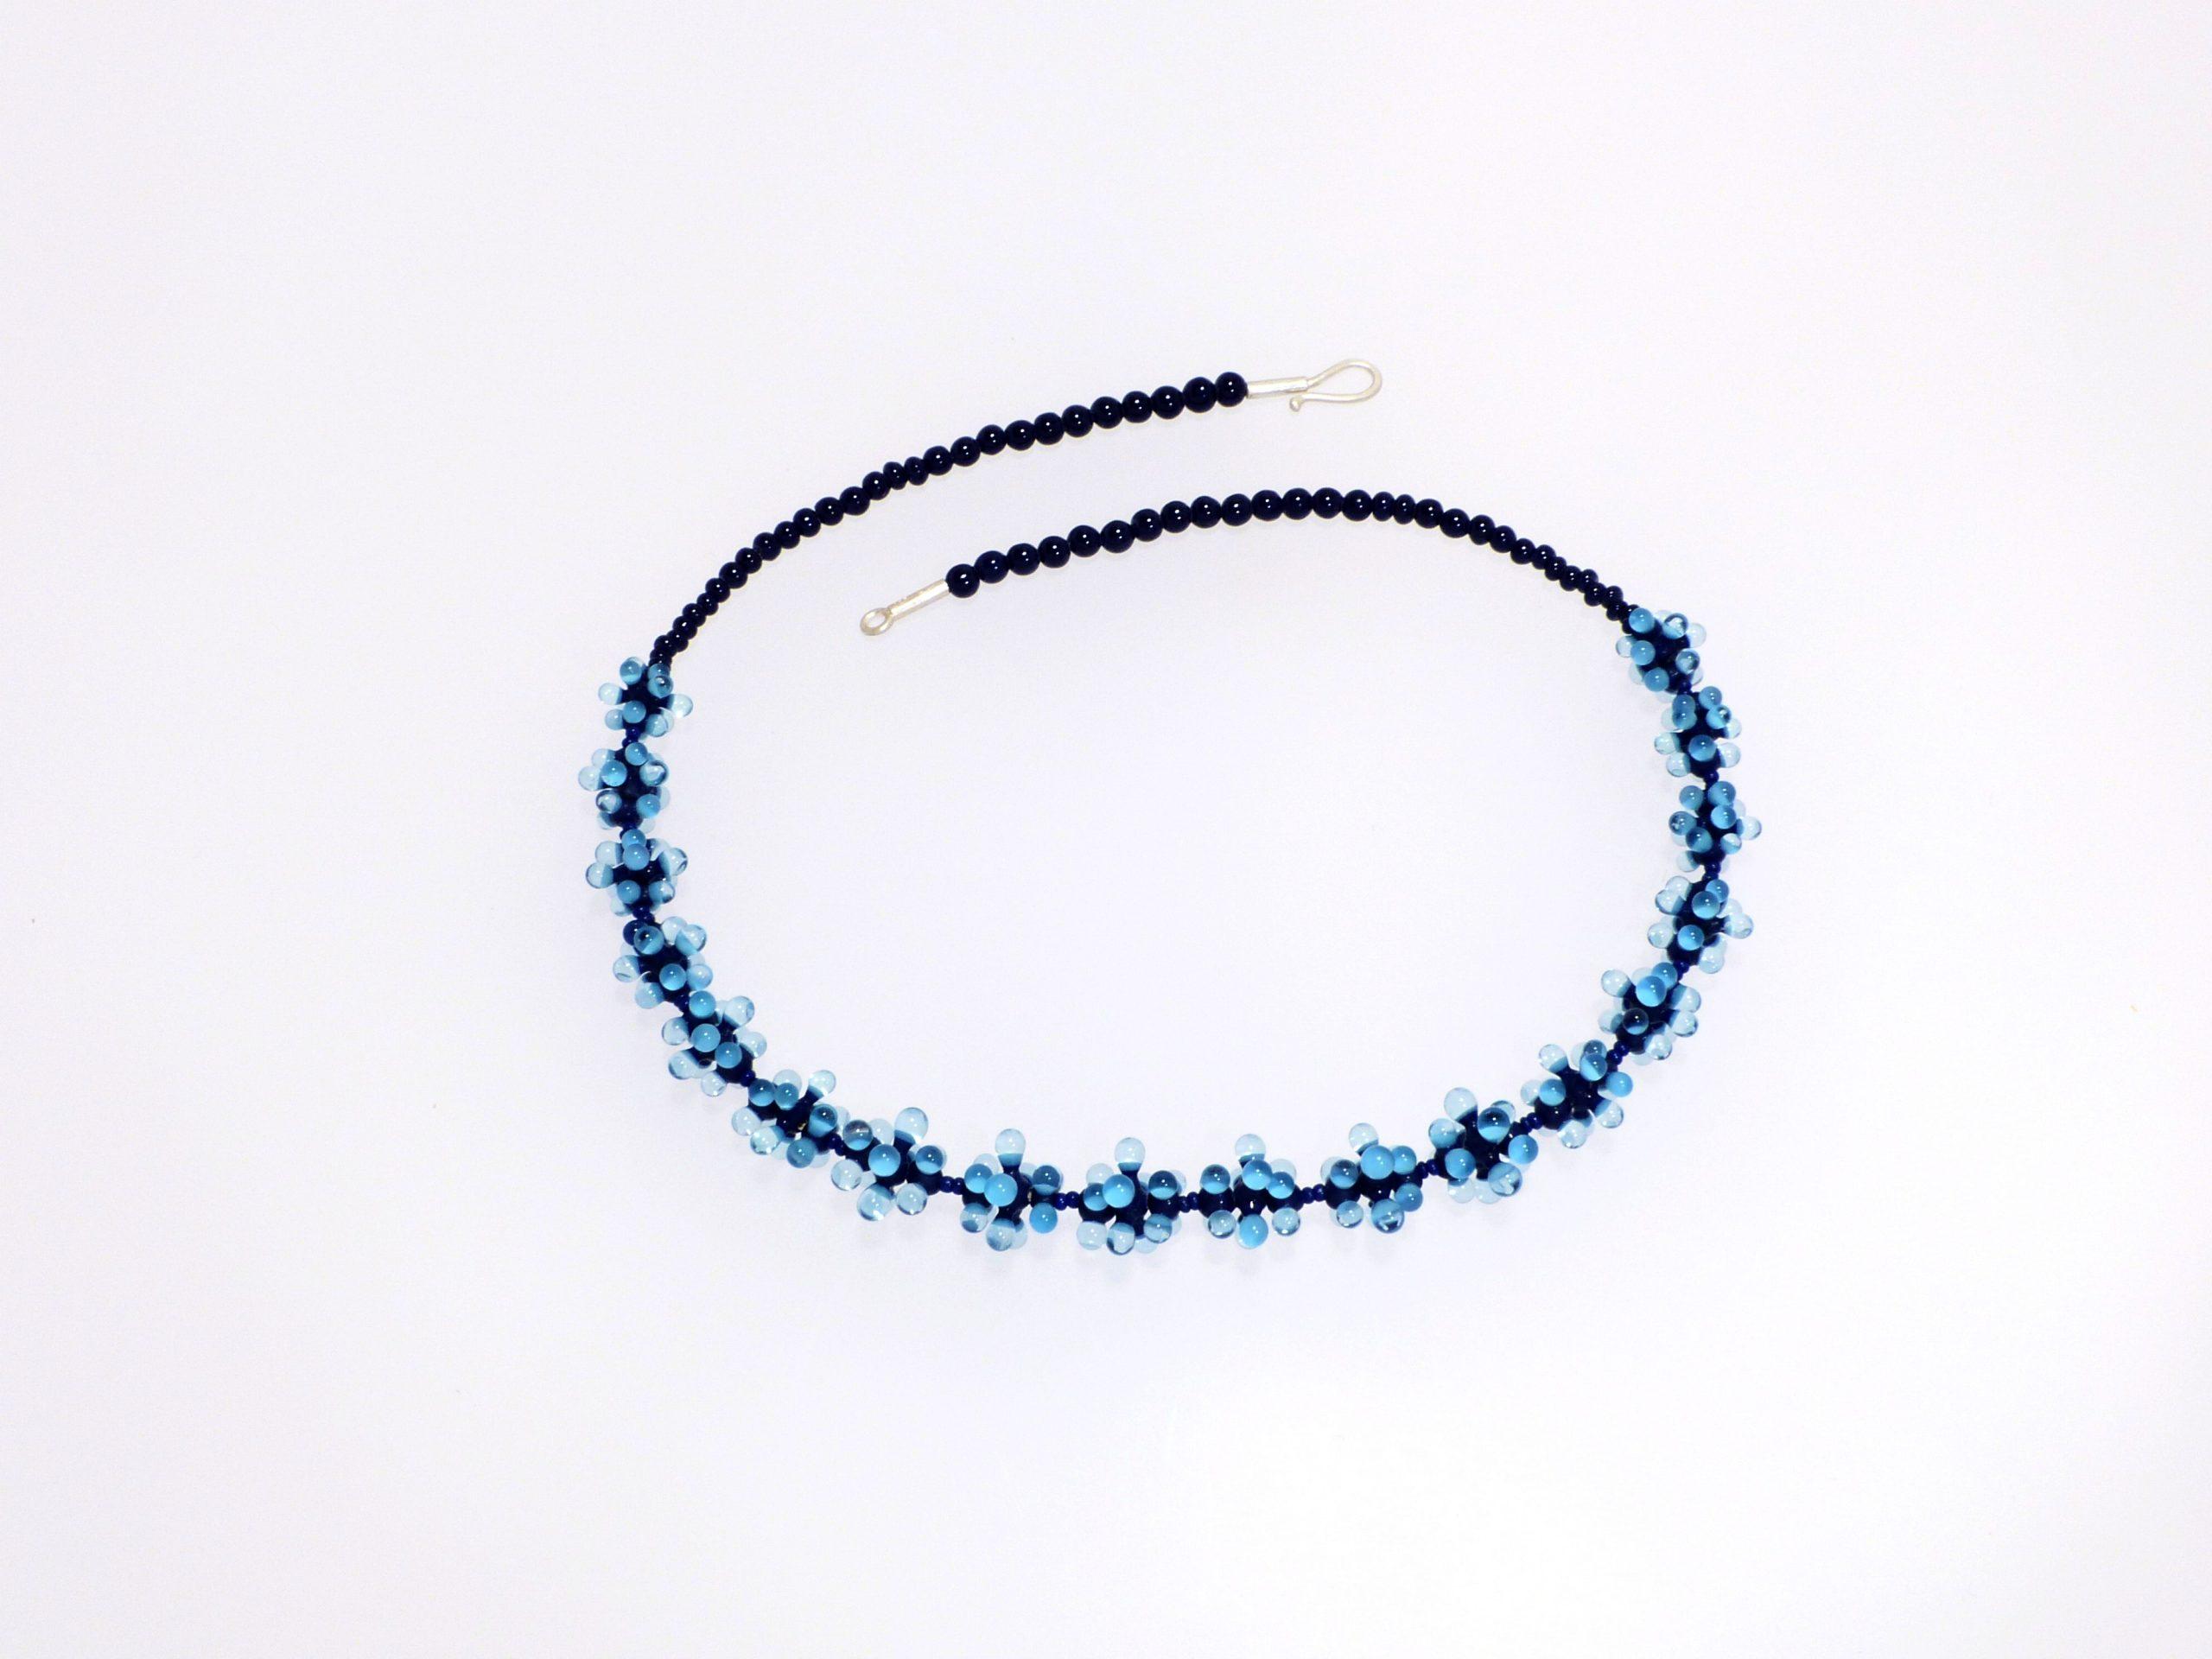 Seeanemone kugelig klein, 3-farbig blau | Glas, Stahlseil, Silber | 1501003-20